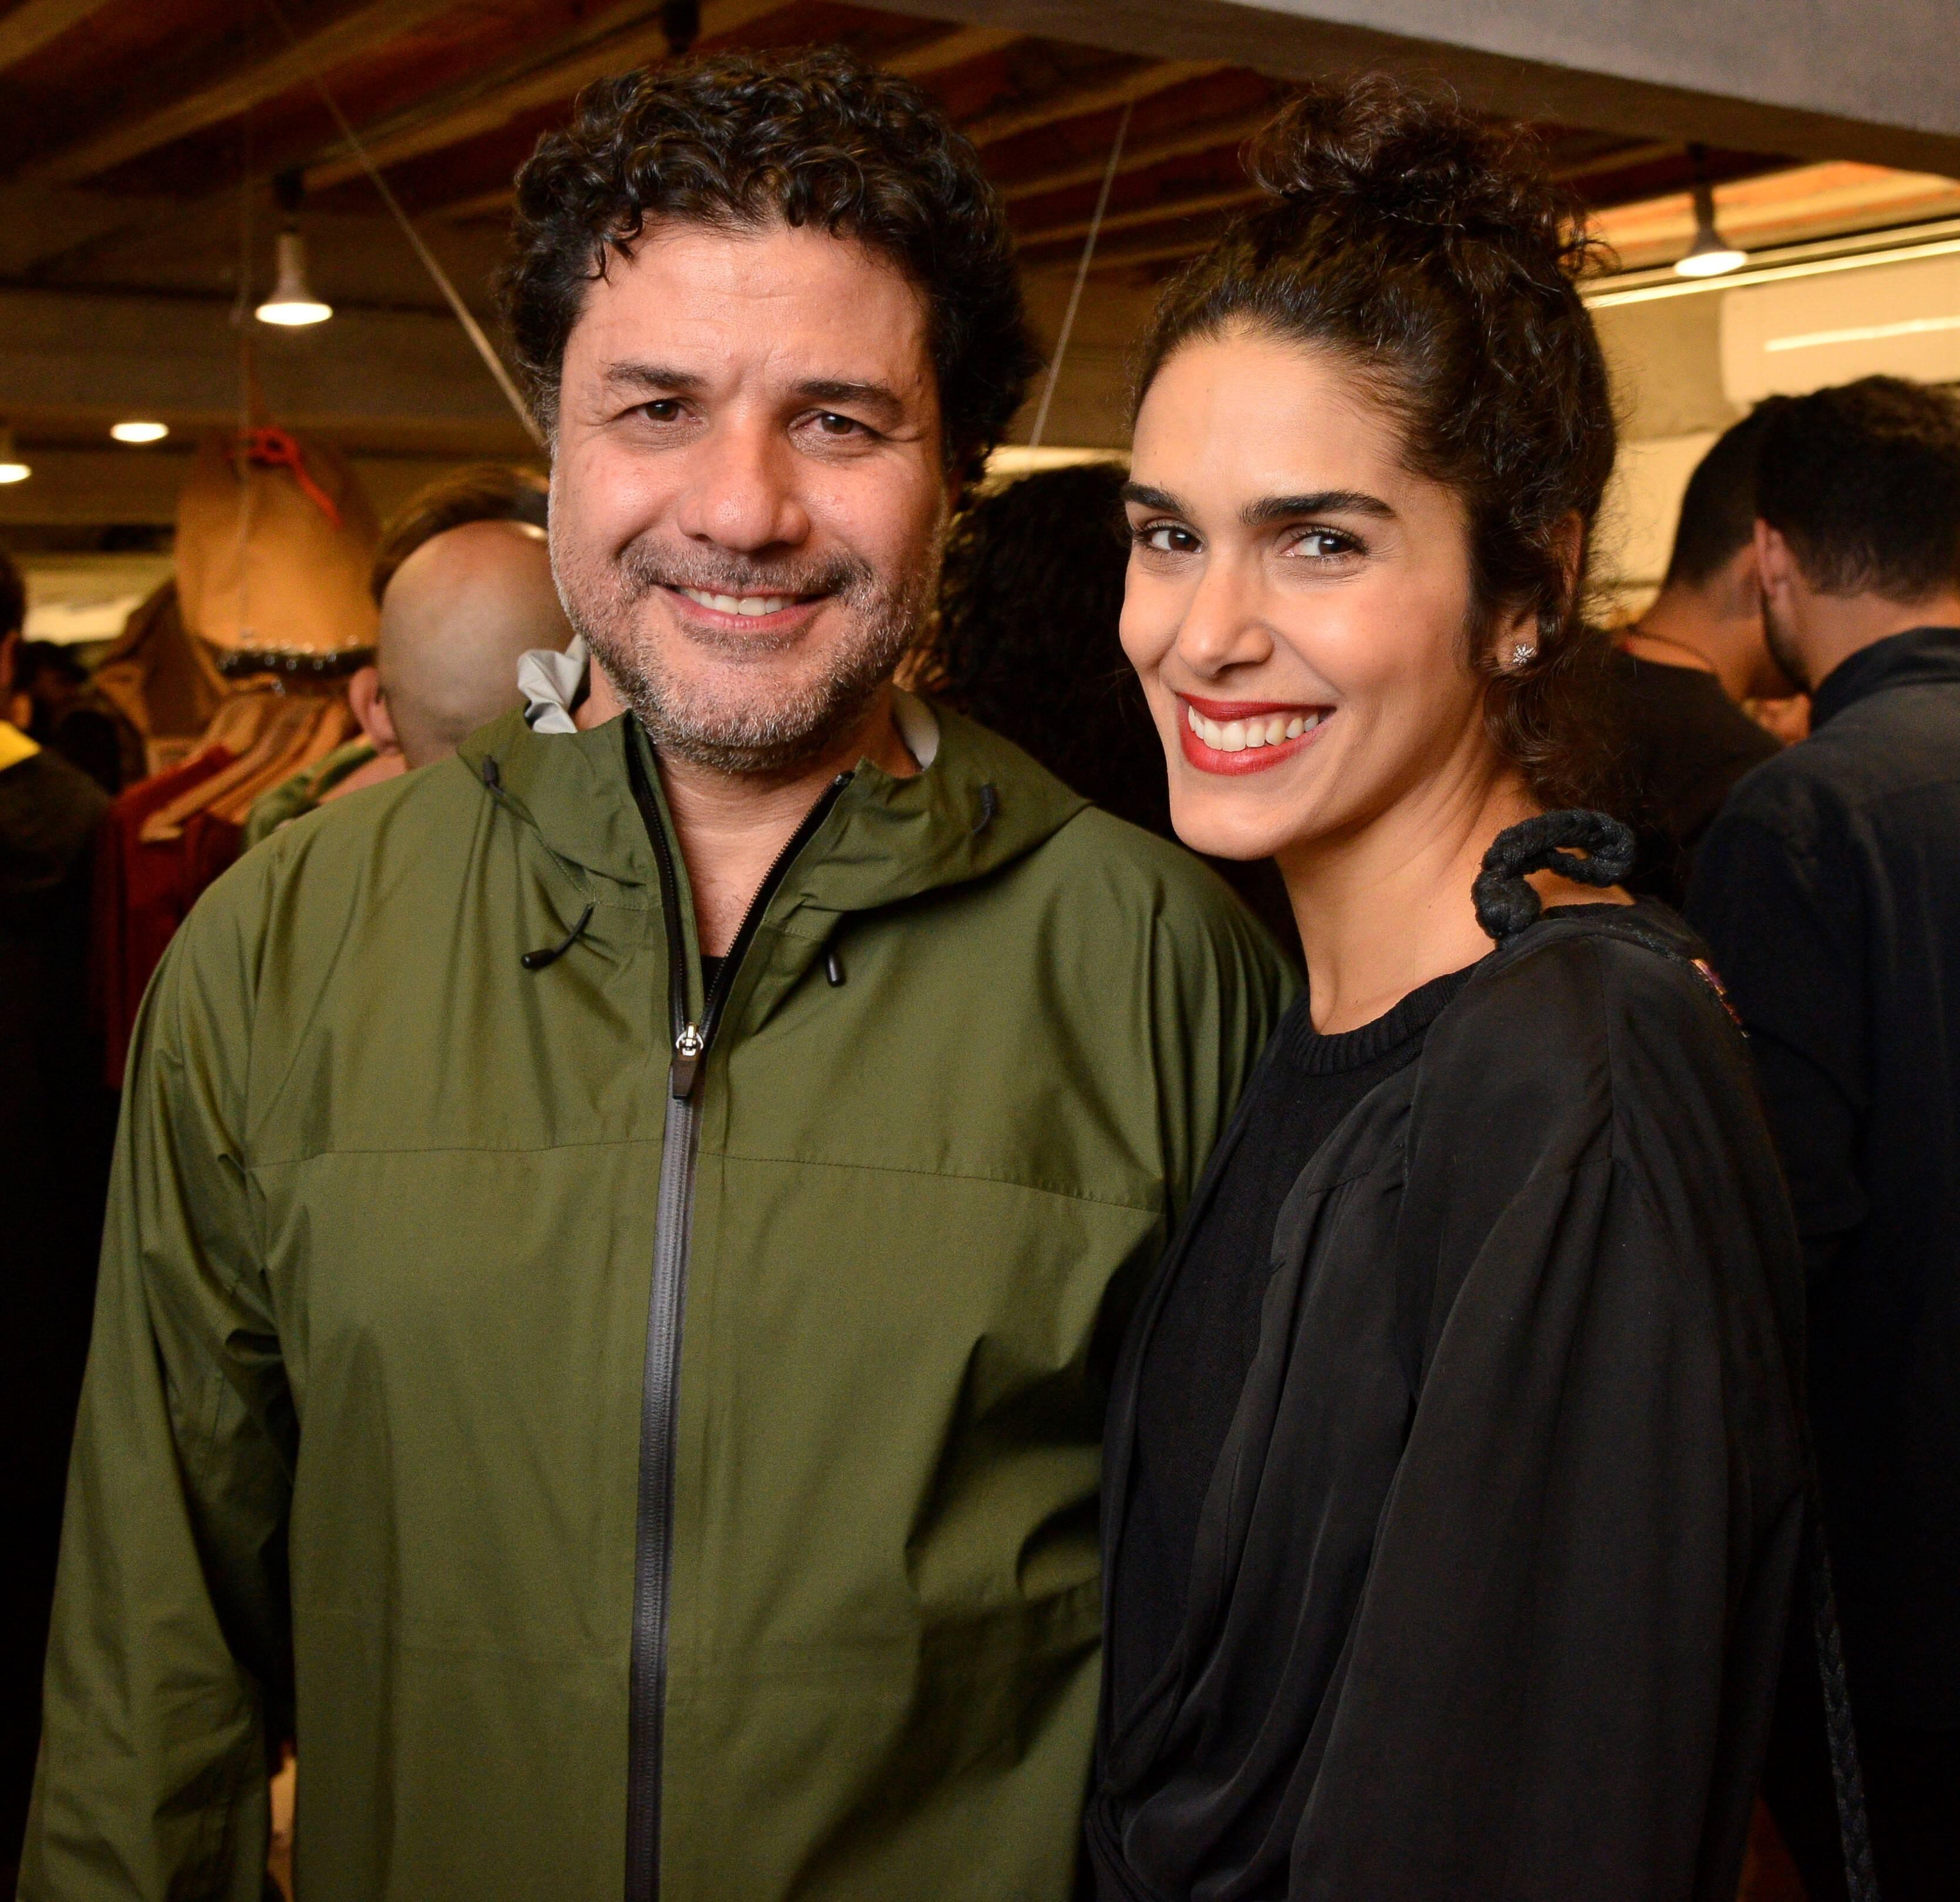 Alexandre Pernet e Leticia Veloso  /Foto: João Sal